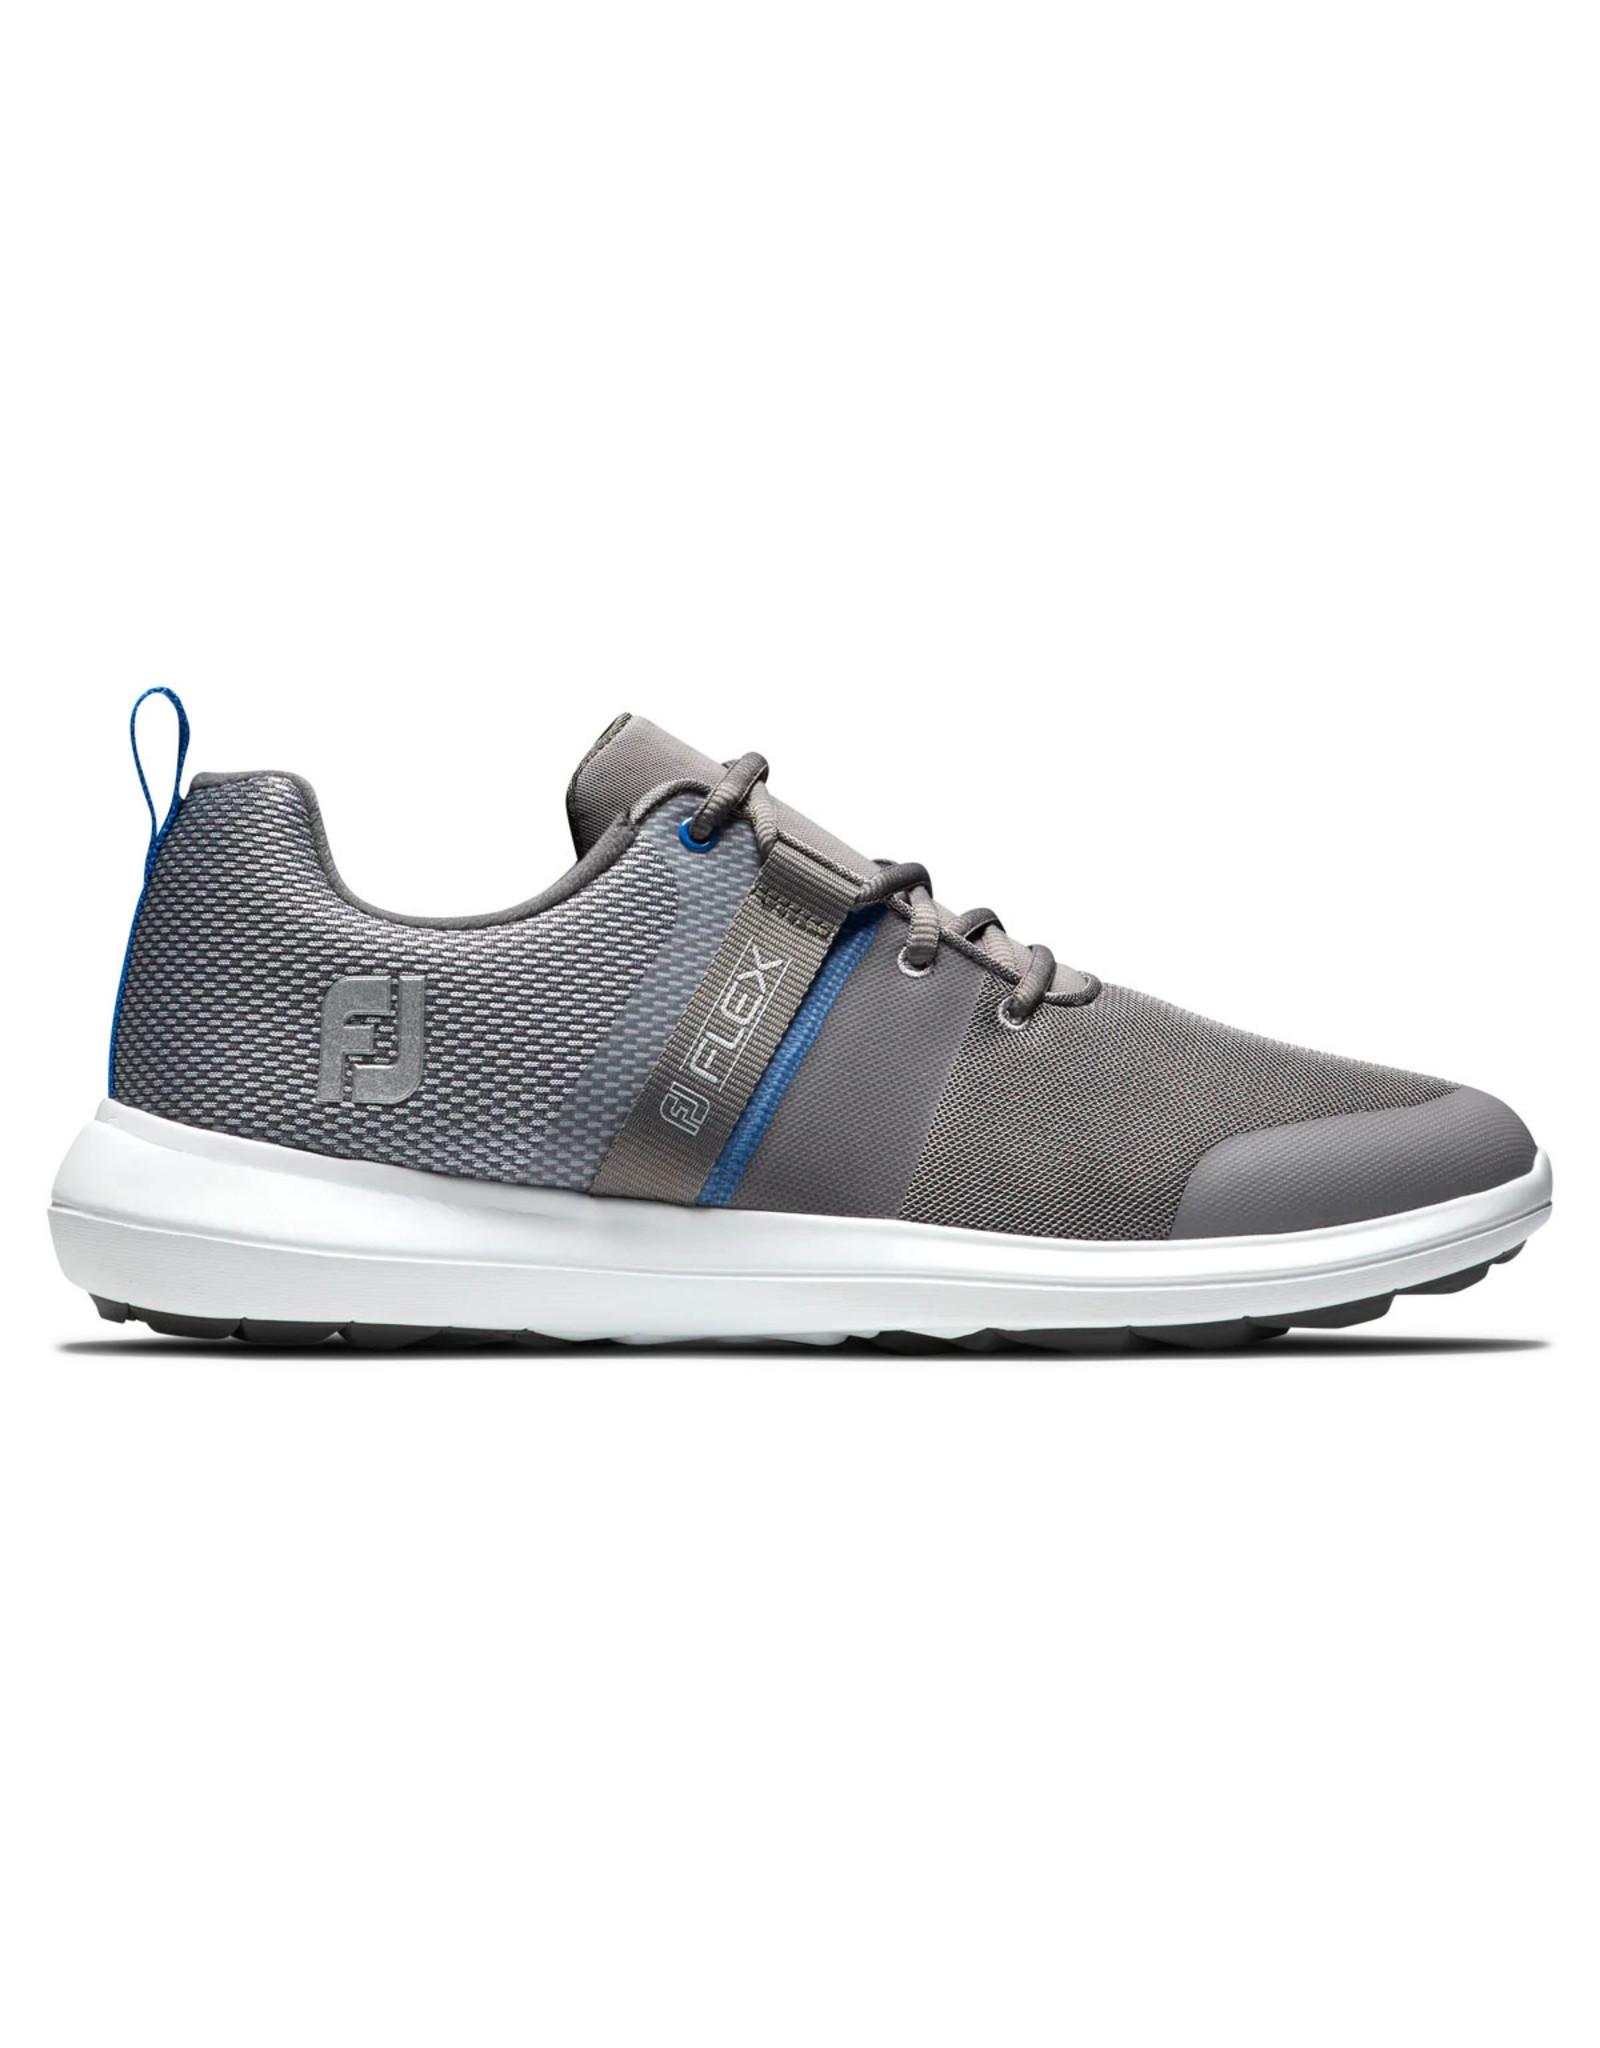 FootJoy FootJoy Men's Flex Grey/Blue